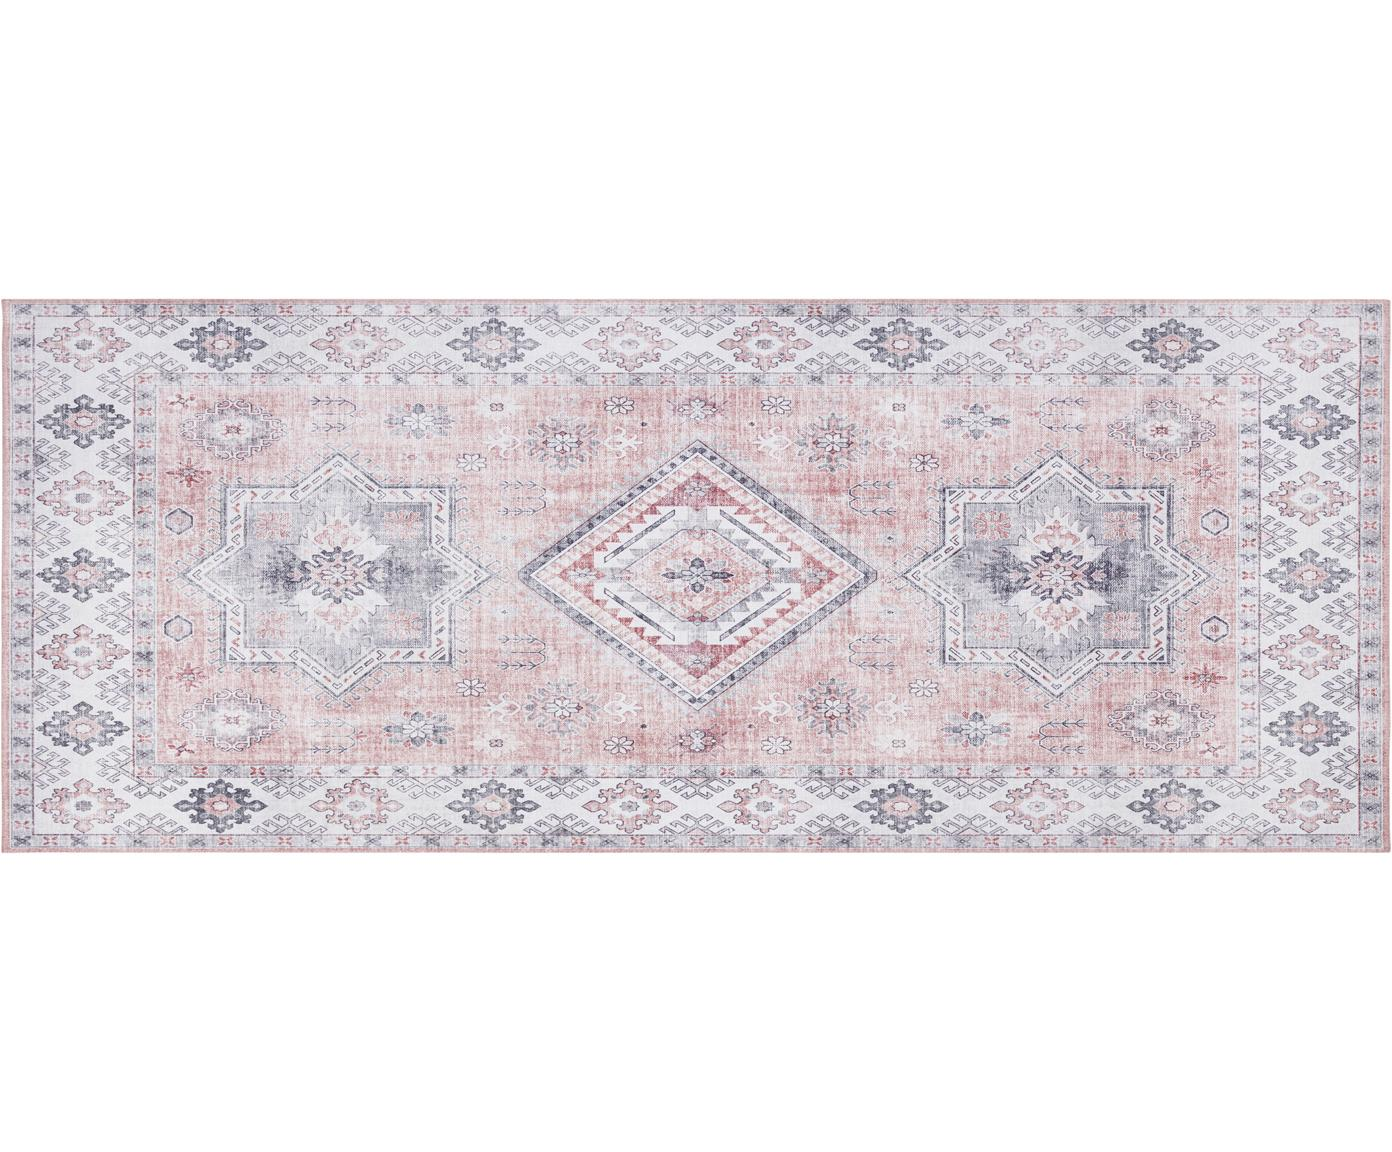 Läufer Gratia im Vintage Style, Altrosa, Grau, 80 x 200 cm